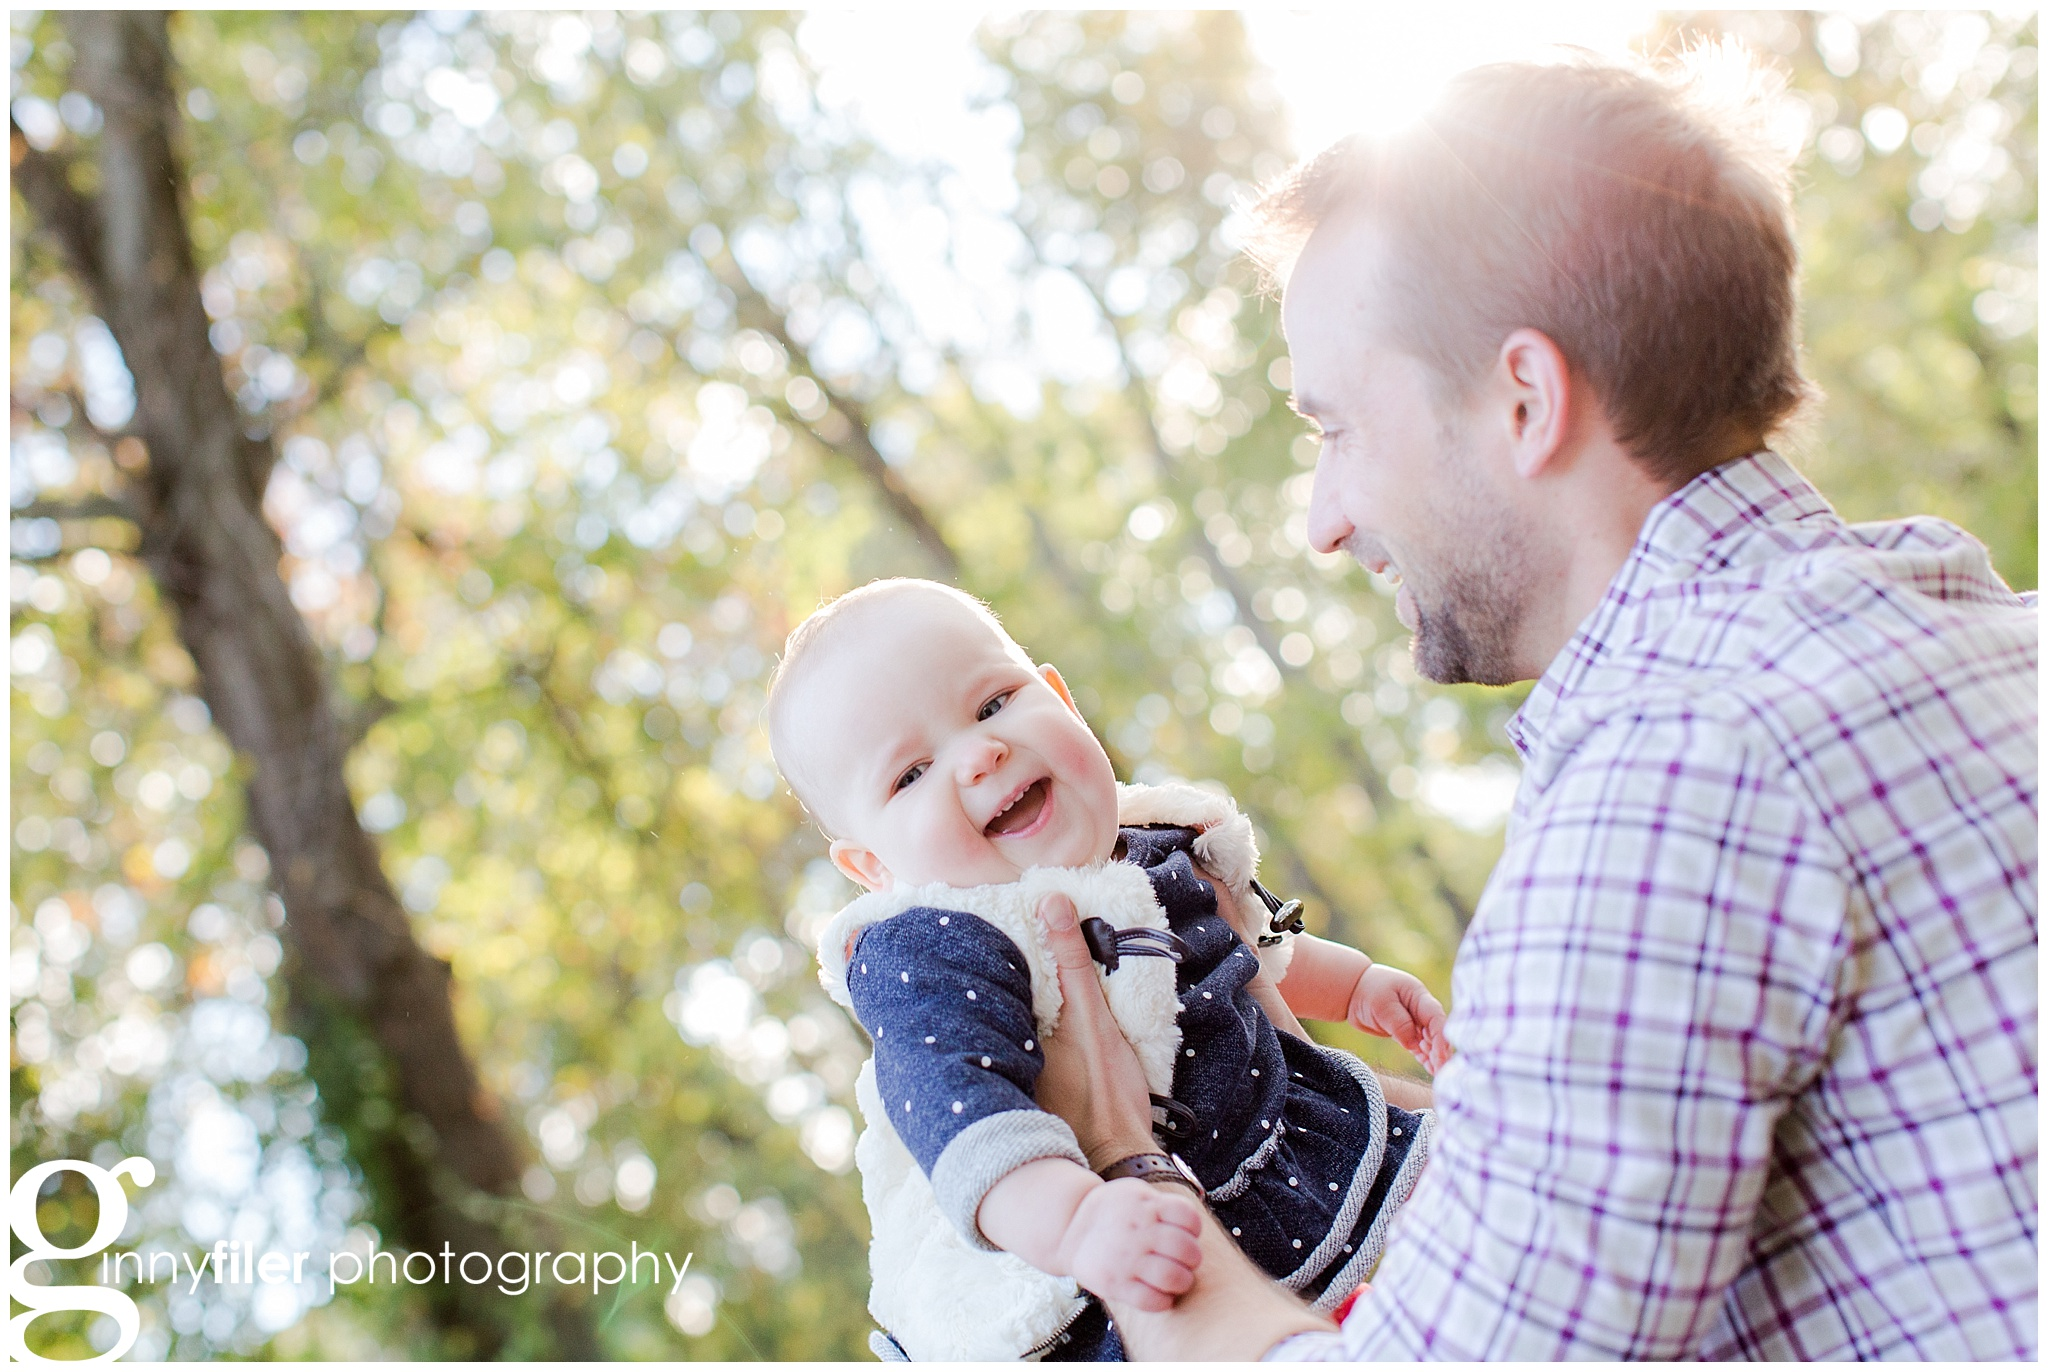 family_photography_klesh_0005.jpg